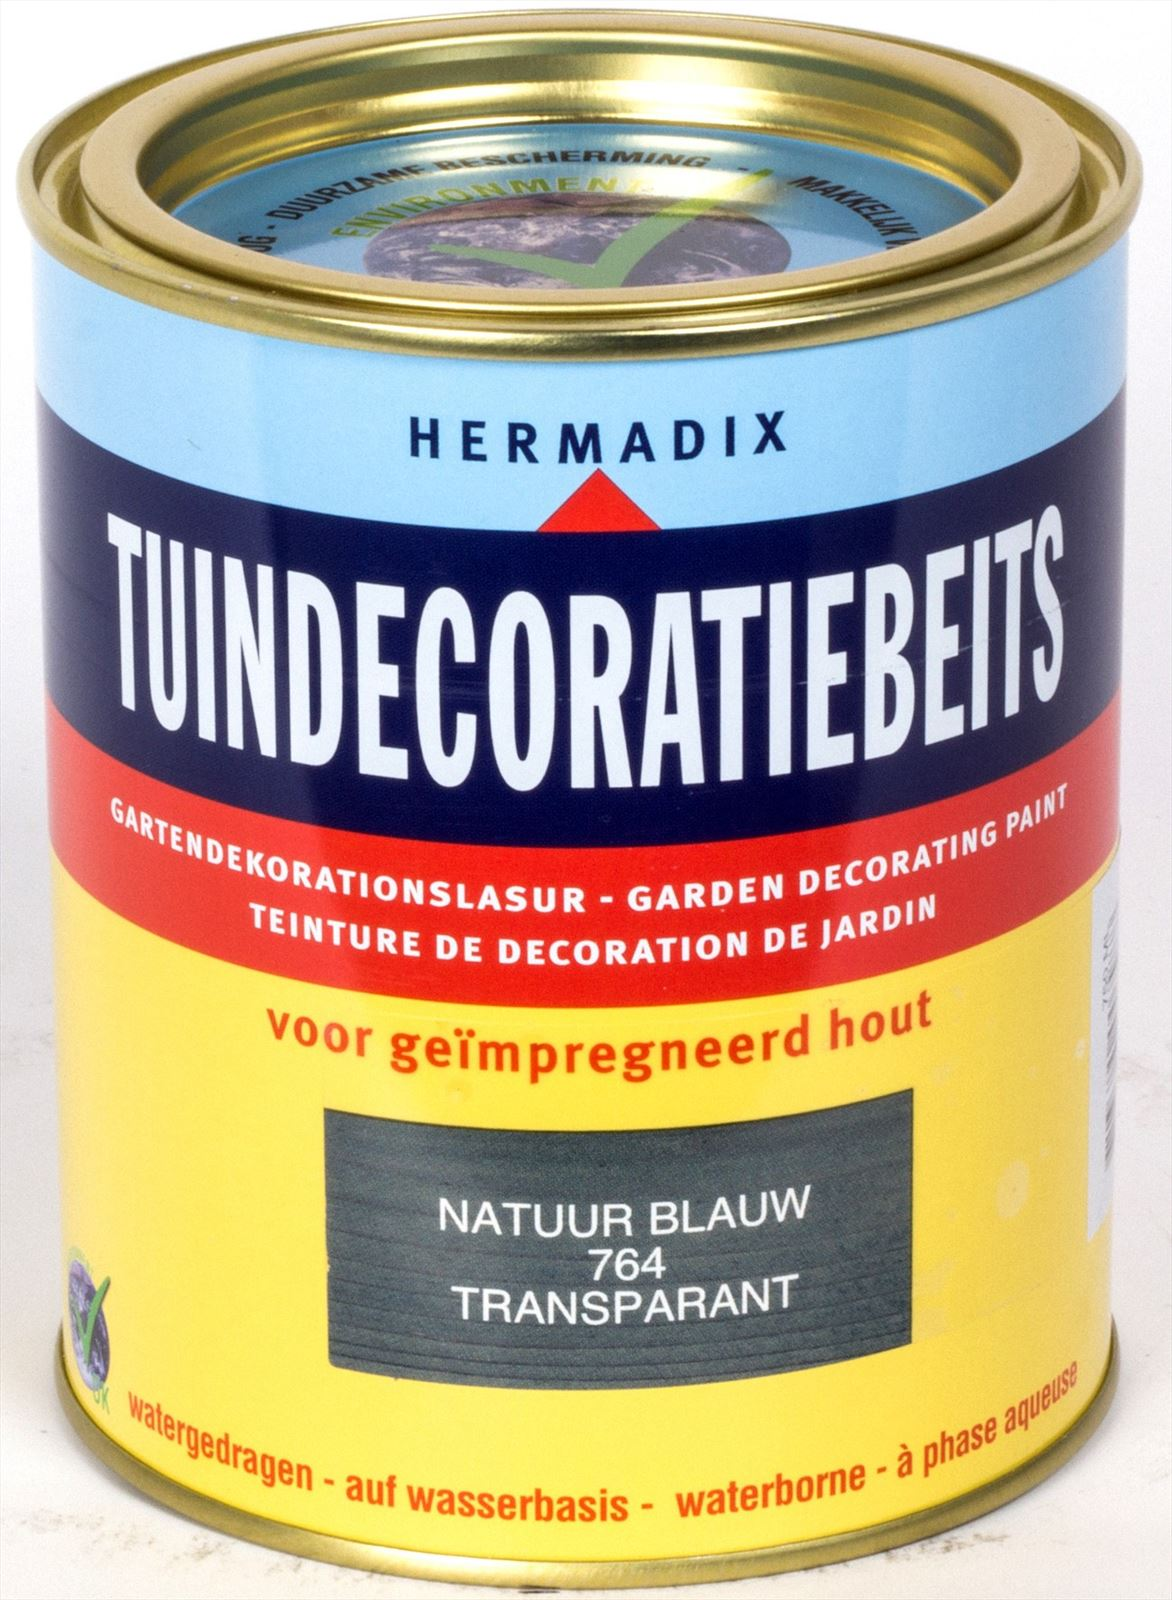 Hermadix beits Hermadix tuindecoratiebeits, transparant, nr. 764 natuur blauw, blik 0,75 liter